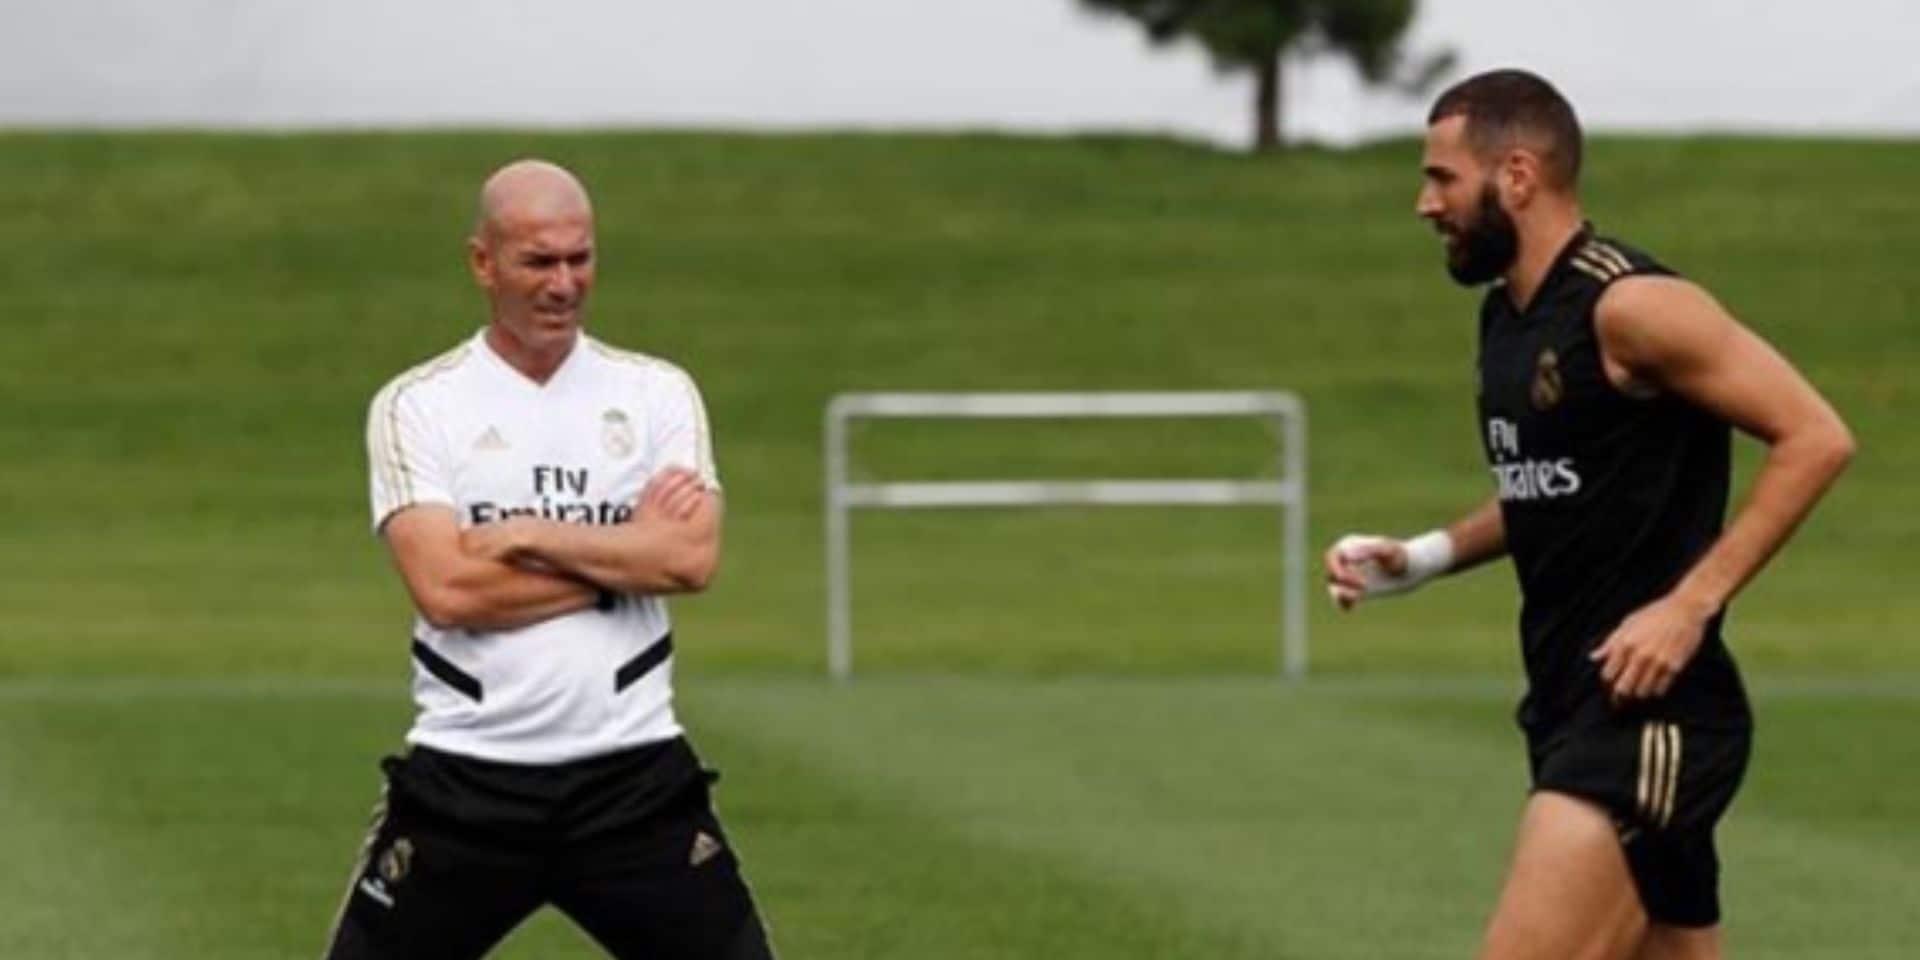 Booba chambre Zinédine Zidane: Karim Benzema défend son coach